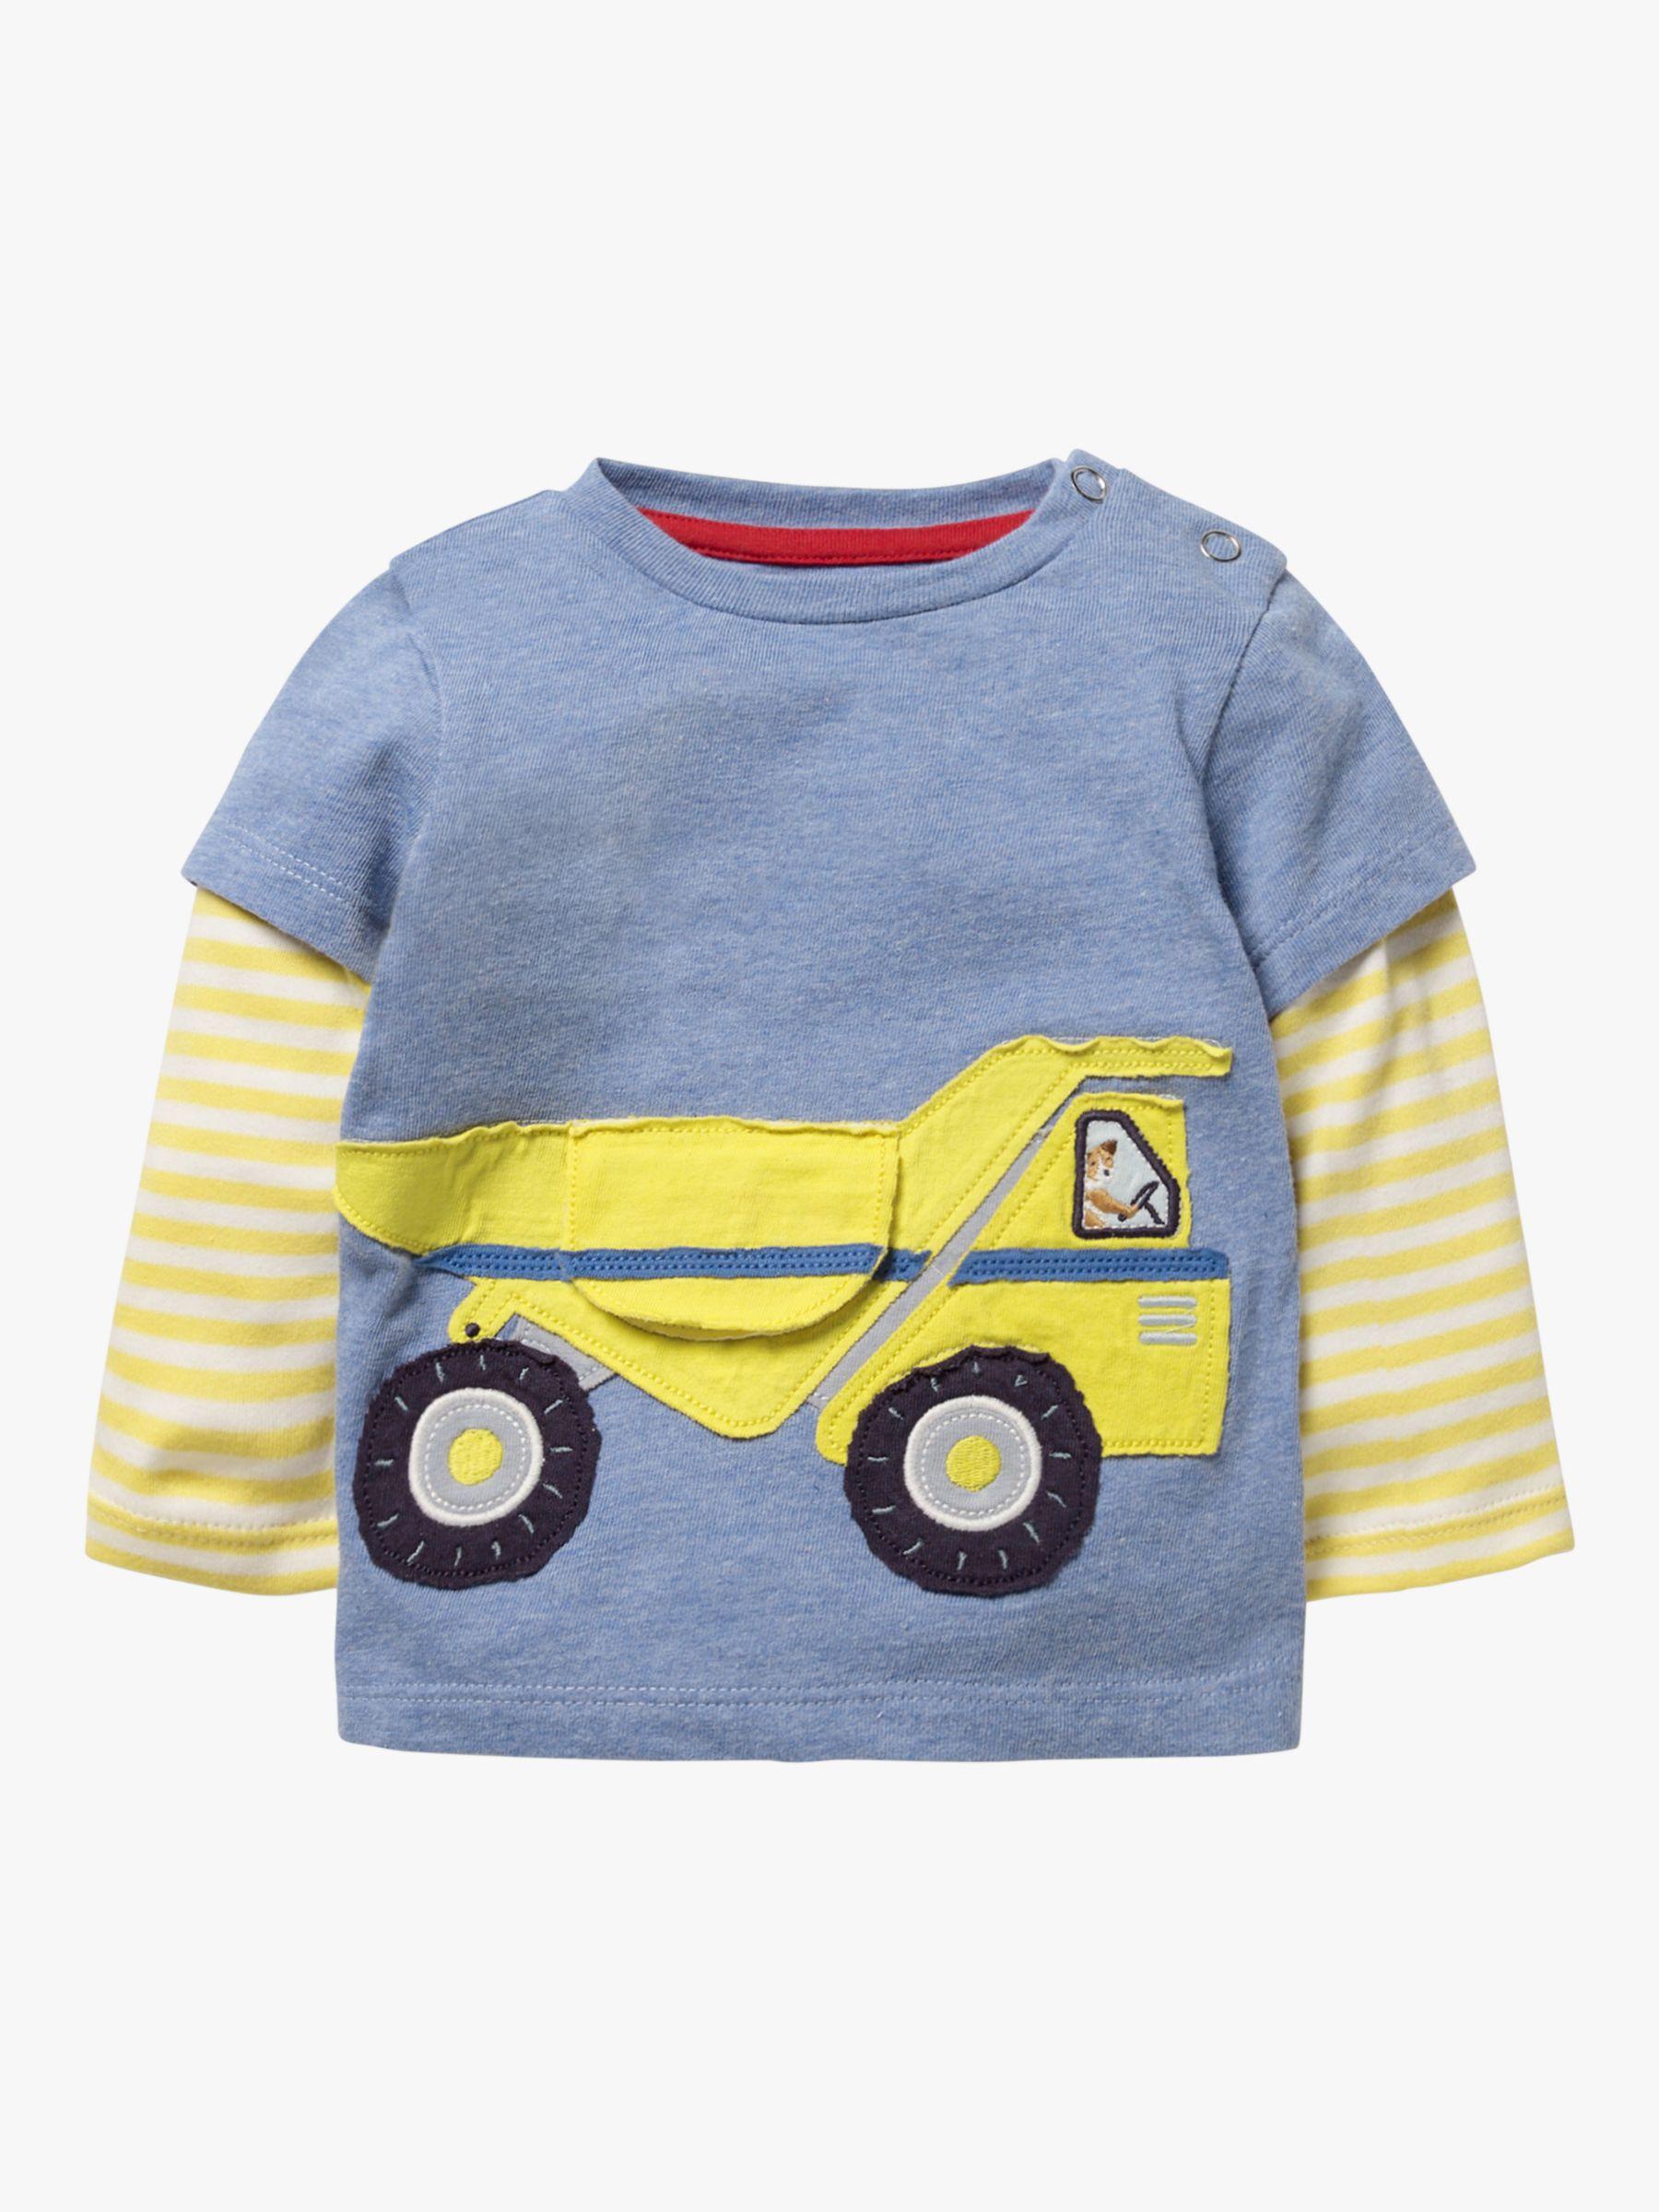 Mini Boden Mini Boden Baby Truck Appliqué Stripe Sleeve Top, Blue Marl